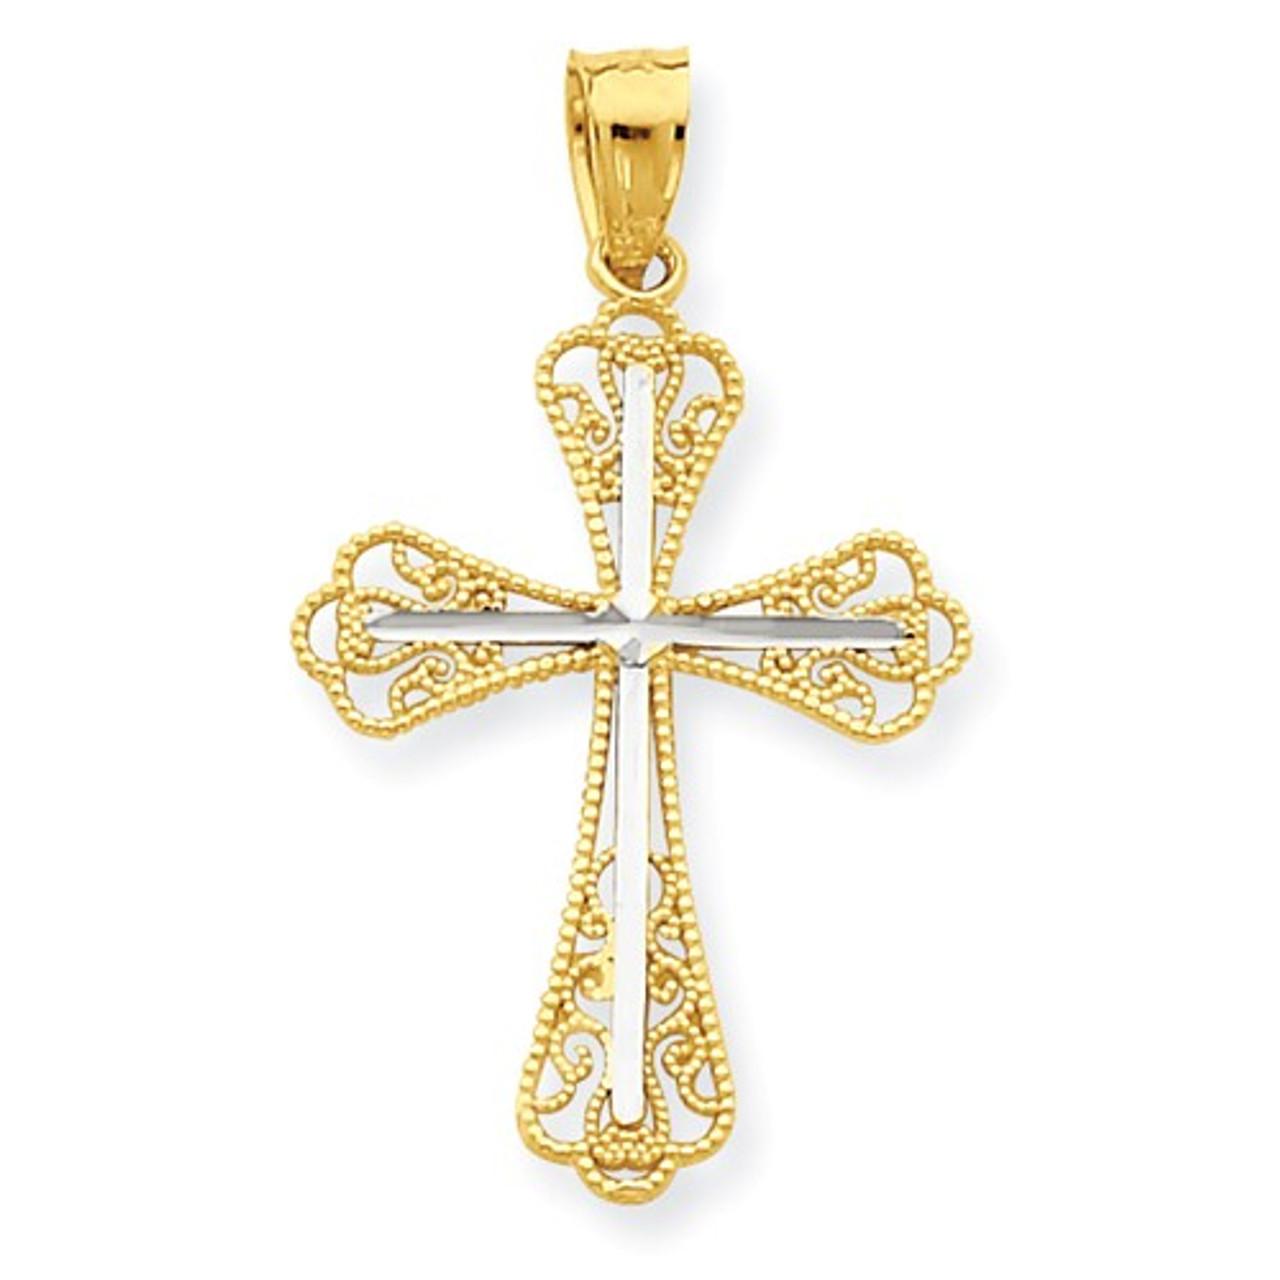 10K Rhodium Plated Yellow Gold /& Rhodium Crucifix Pendant